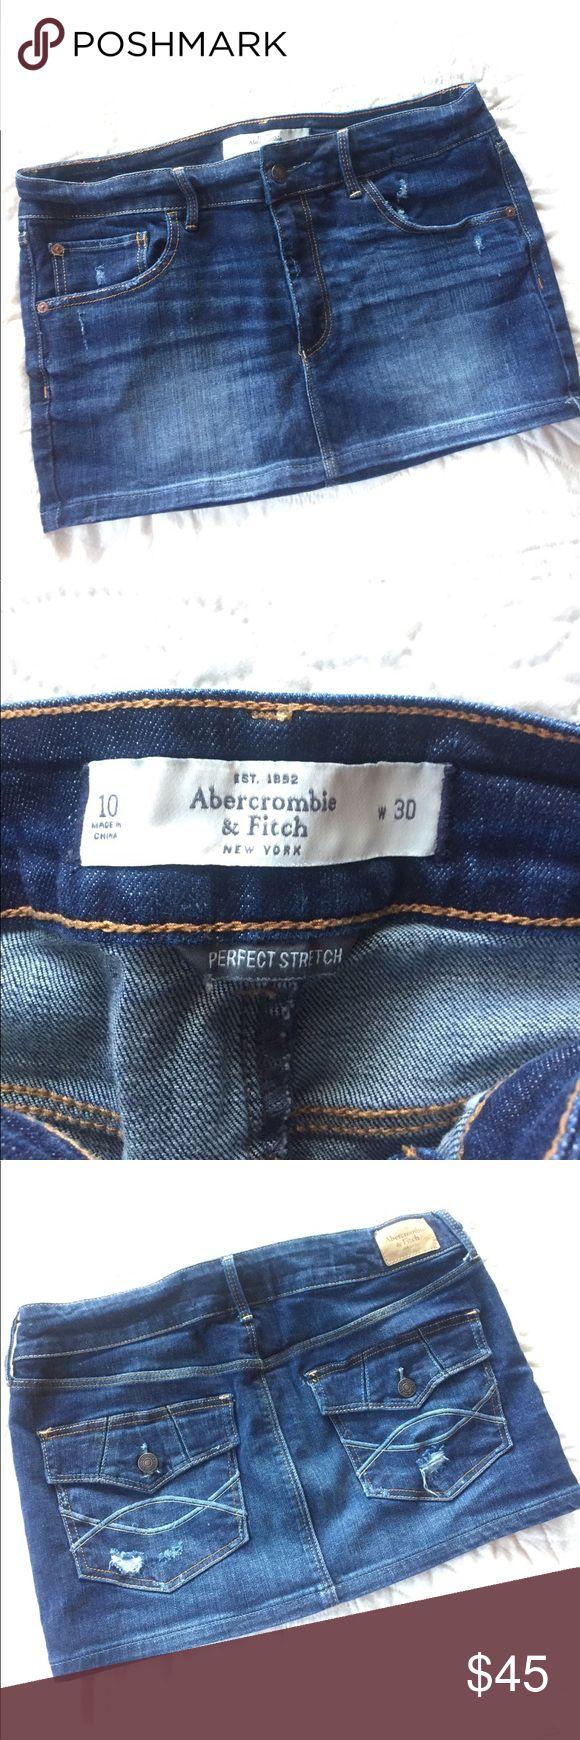 Denim Short Skirt 30 Abercrombie and Fitch Looks like new, dark denim, nice stretch. Love the back pockets! 99% Cotton 1% Elastine Abercrombie & Fitch Skirts Mini